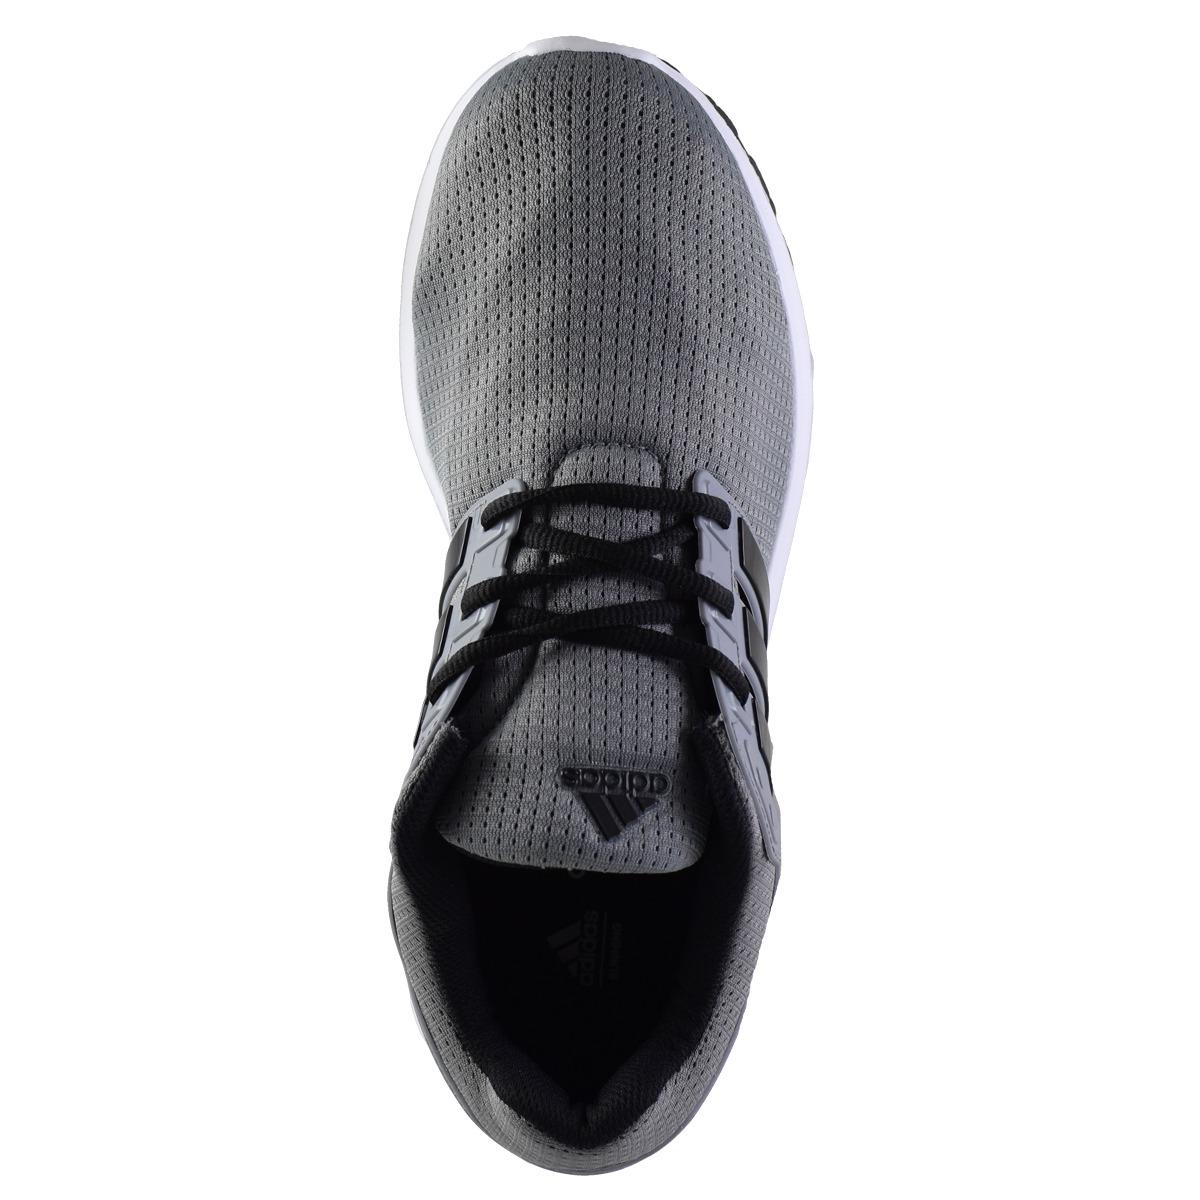 cheap for discount c9d6d b61e0 zapatillas adidas energy cloud wtc hombre grisnegro. Cargando zoom.